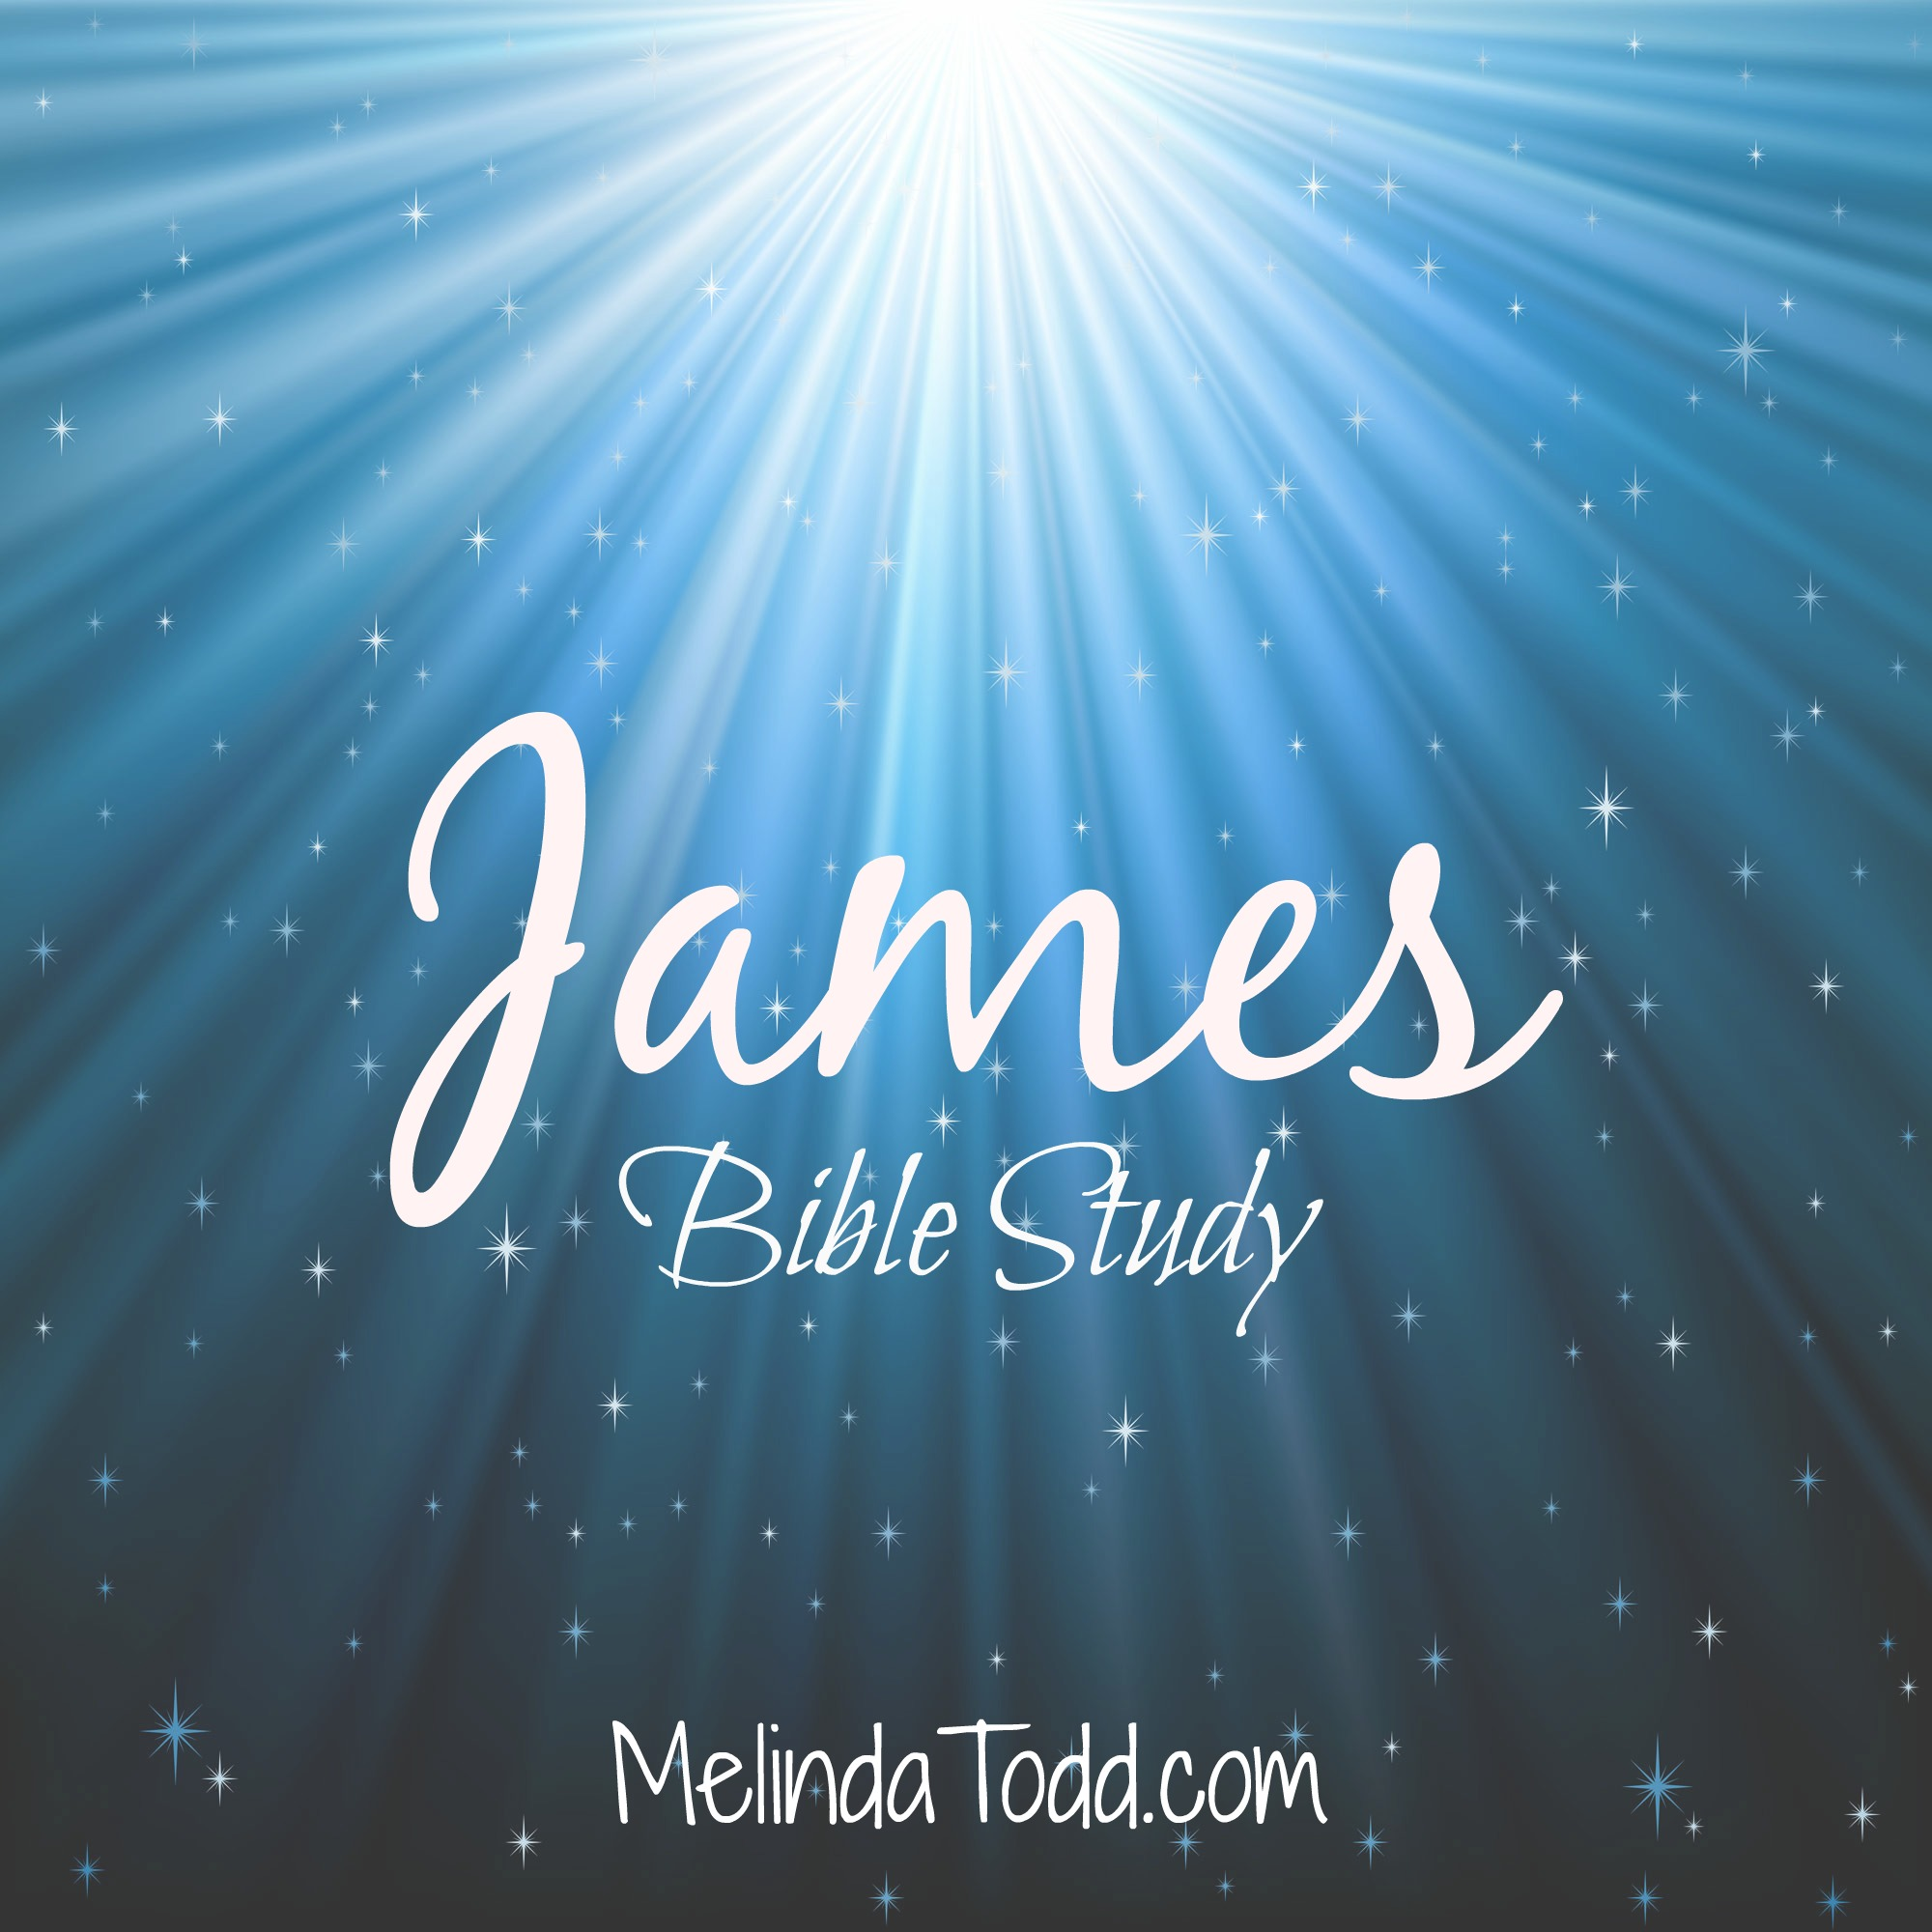 James Bible Study Day 8